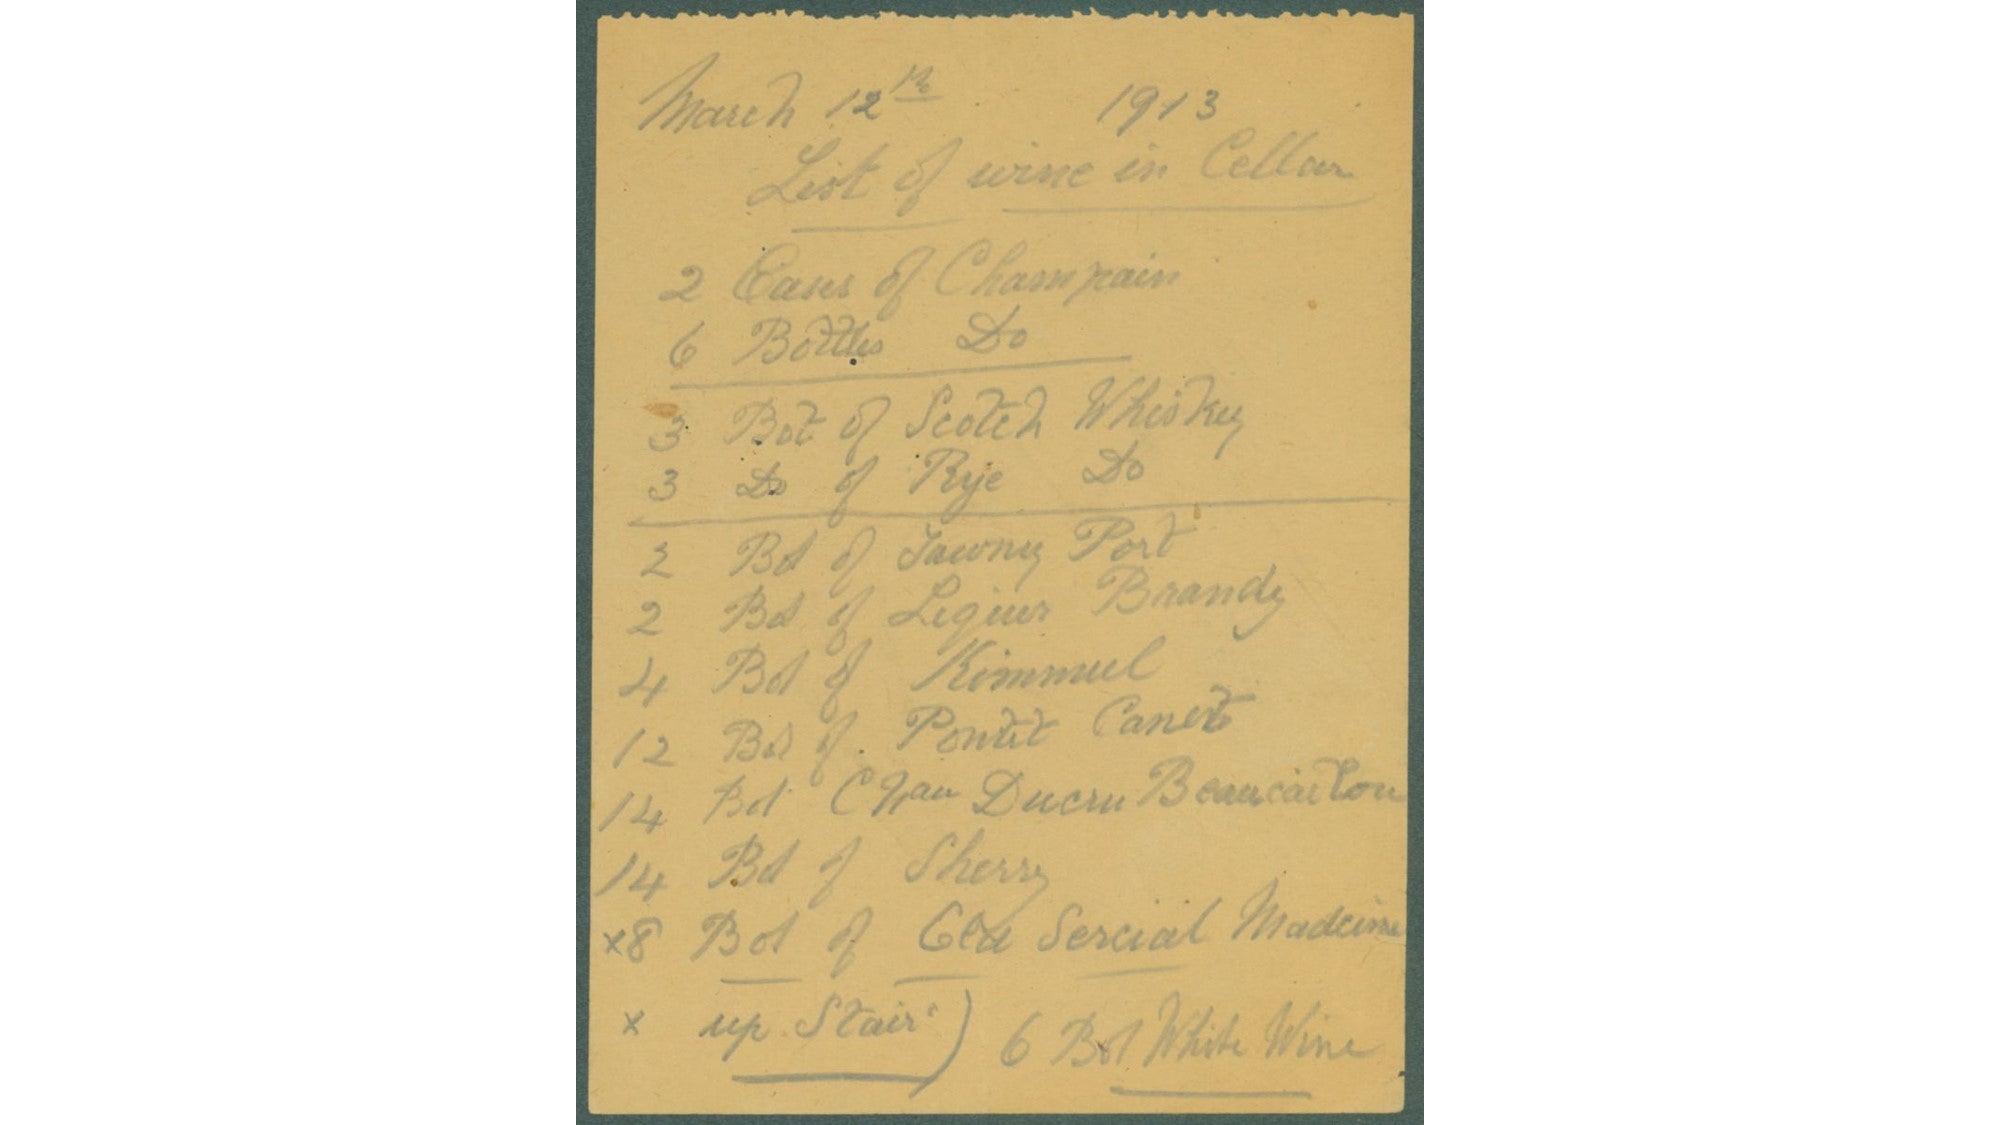 Archival list of wines in Biltmore's wine cellar